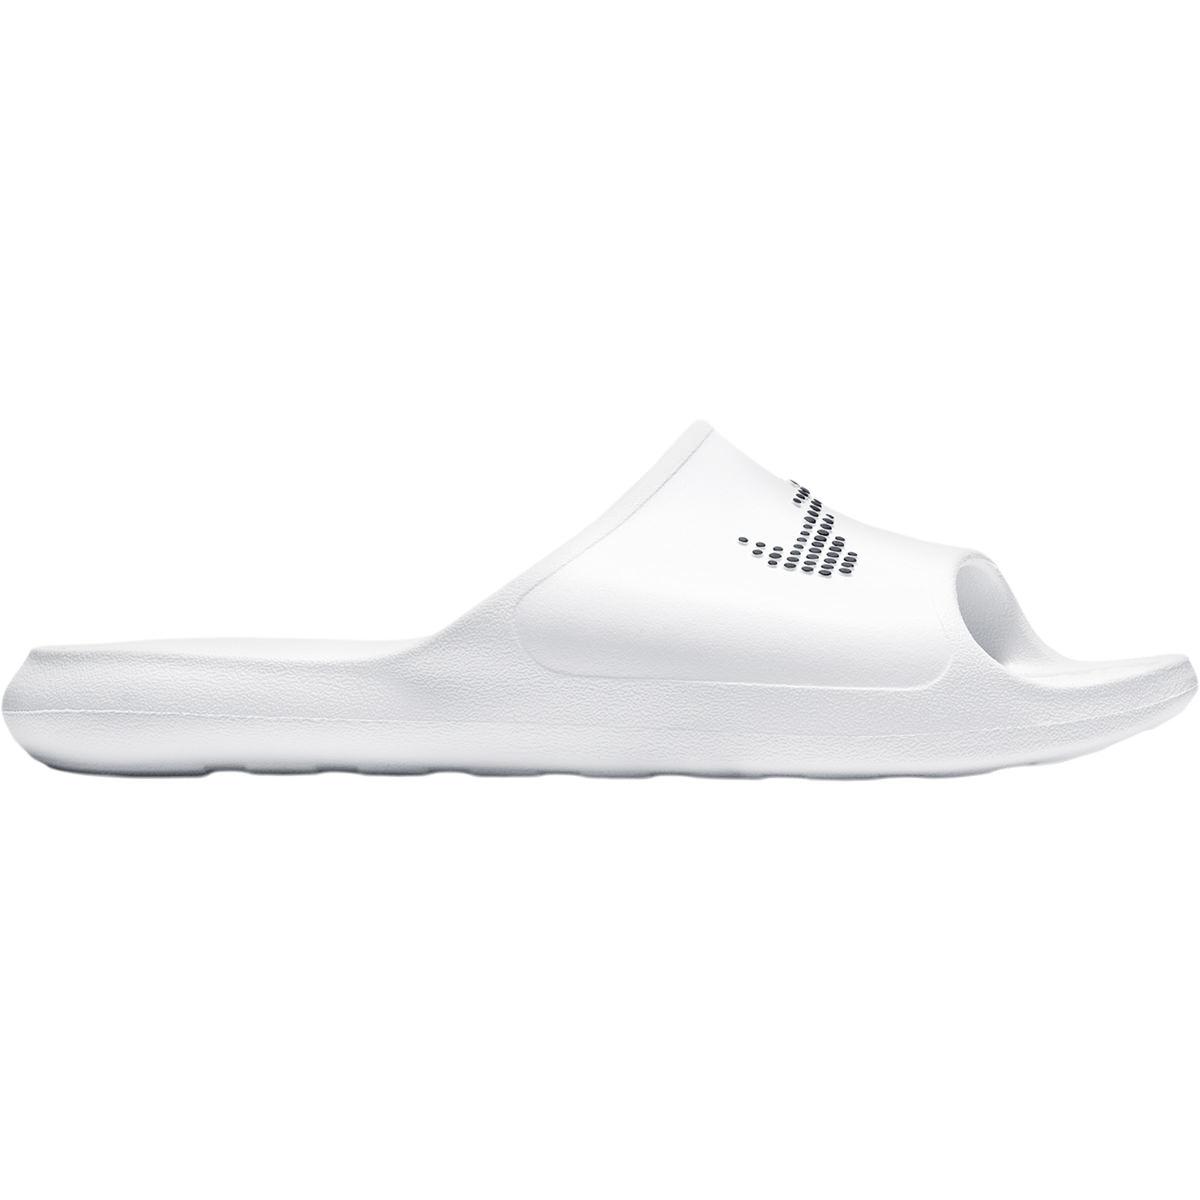 Nike Victori One Shower Slide Badesandaler